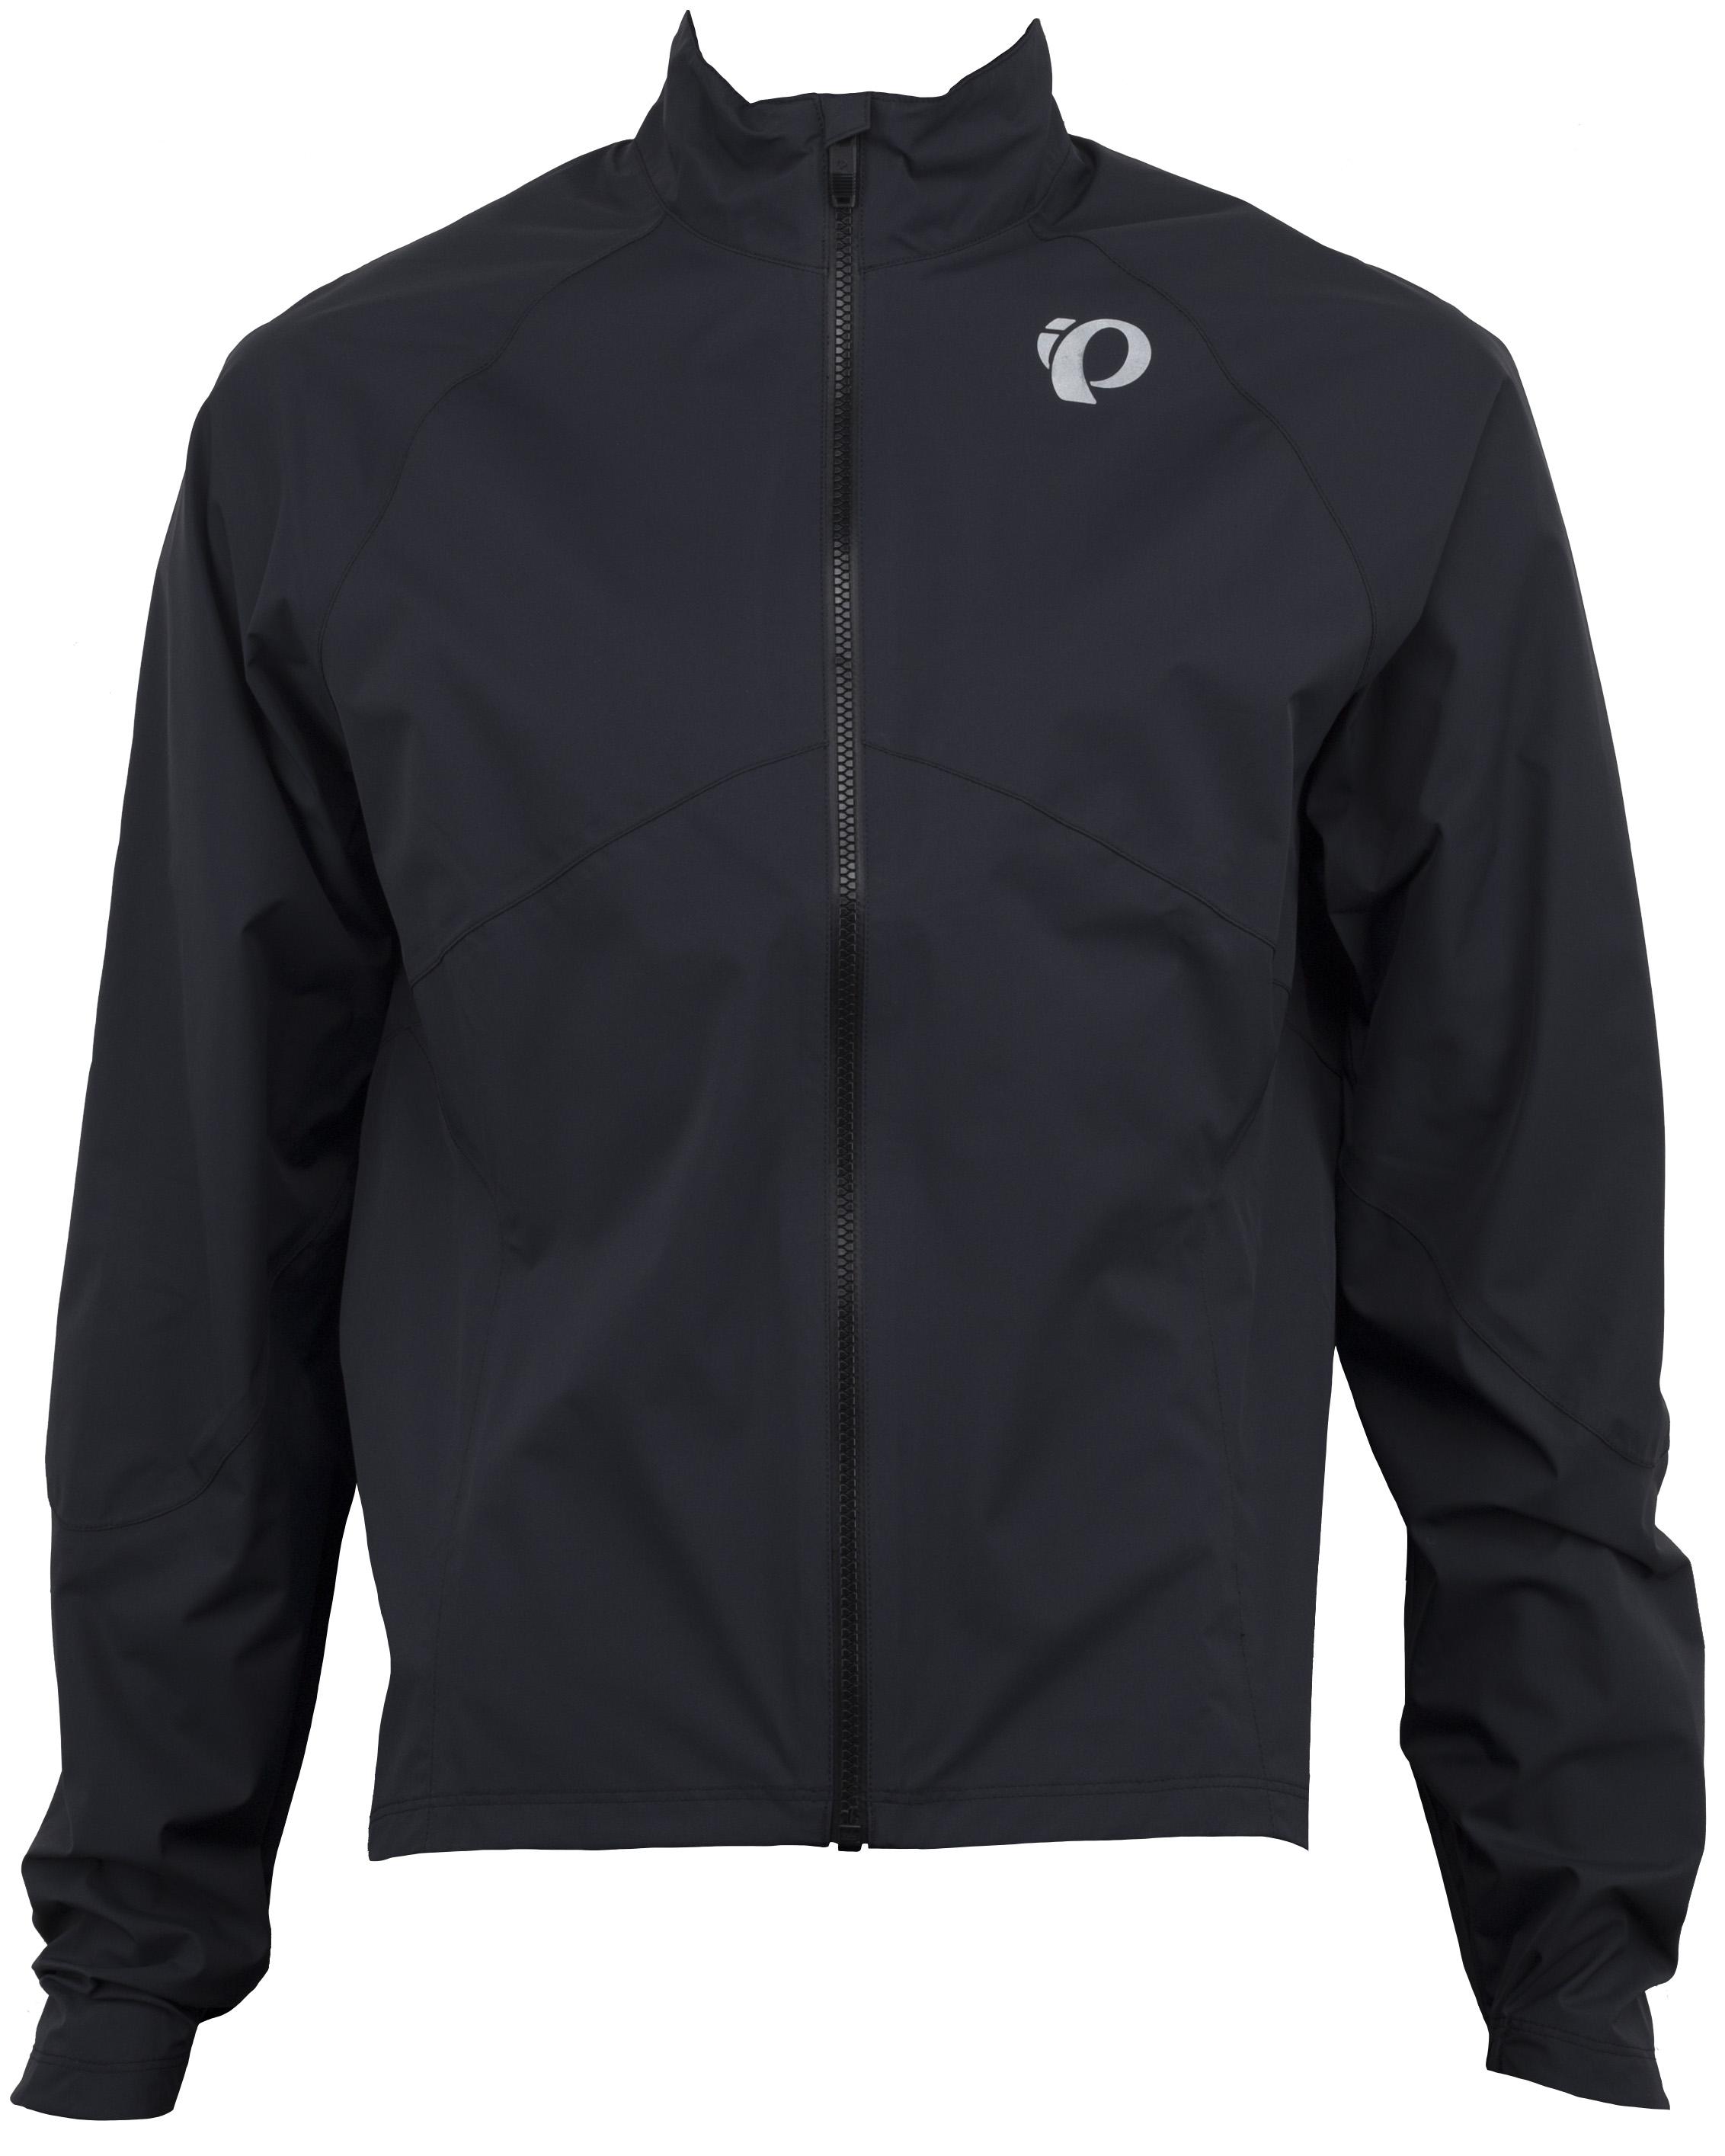 Pearl Izumi | Select Barrier Wxb Jacket Men's | Size Large in Black/Black